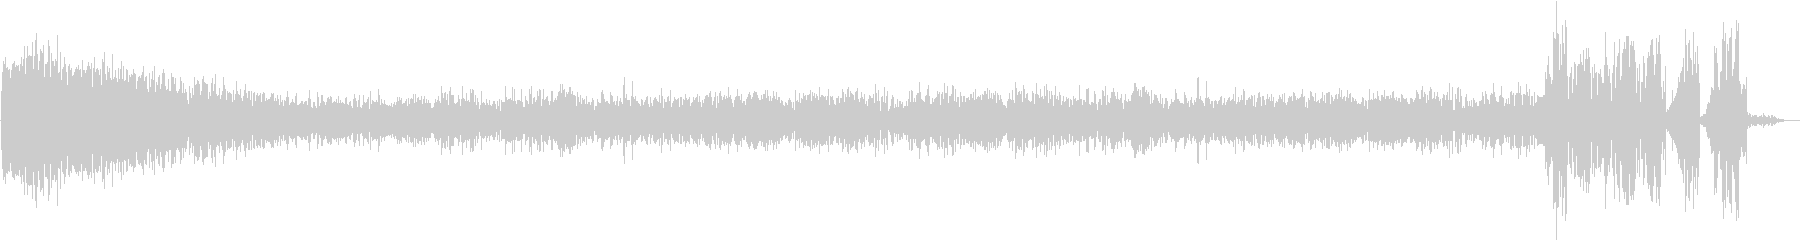 SciFi EC01_93_2の未再生の波形